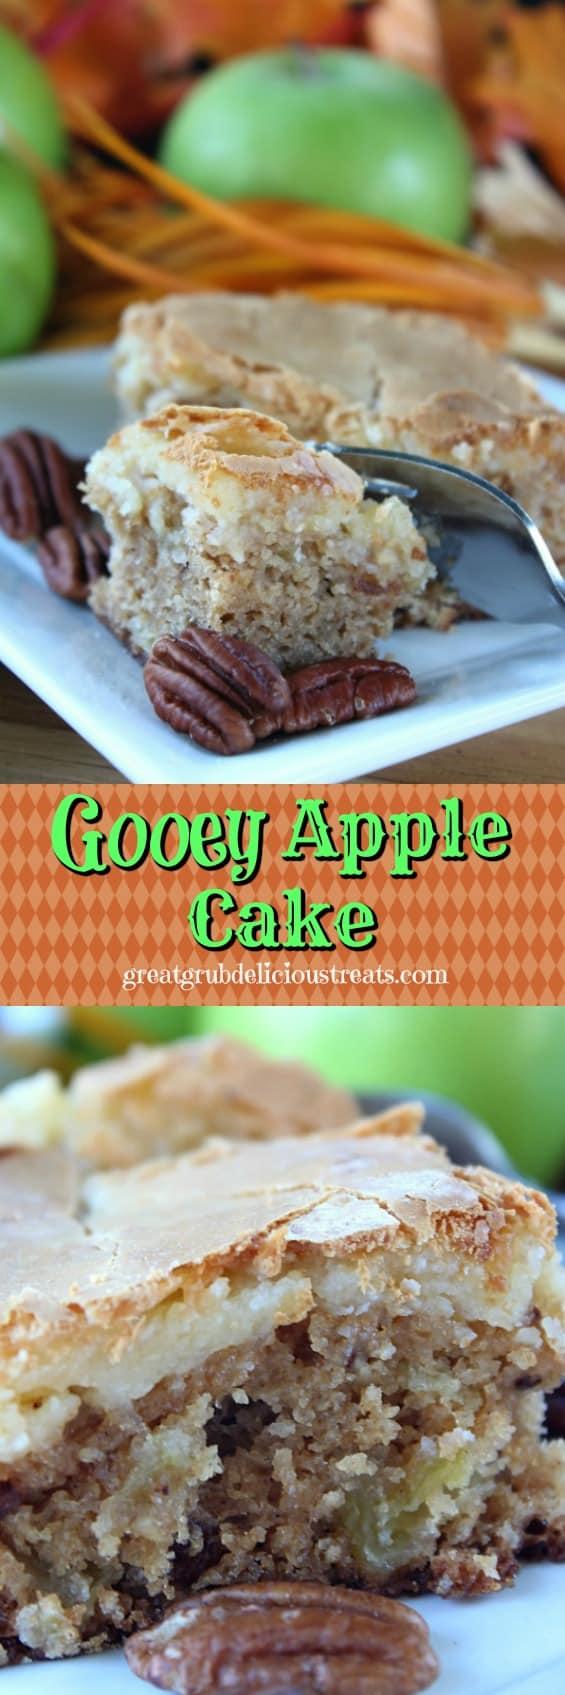 Gooey Apple Cake